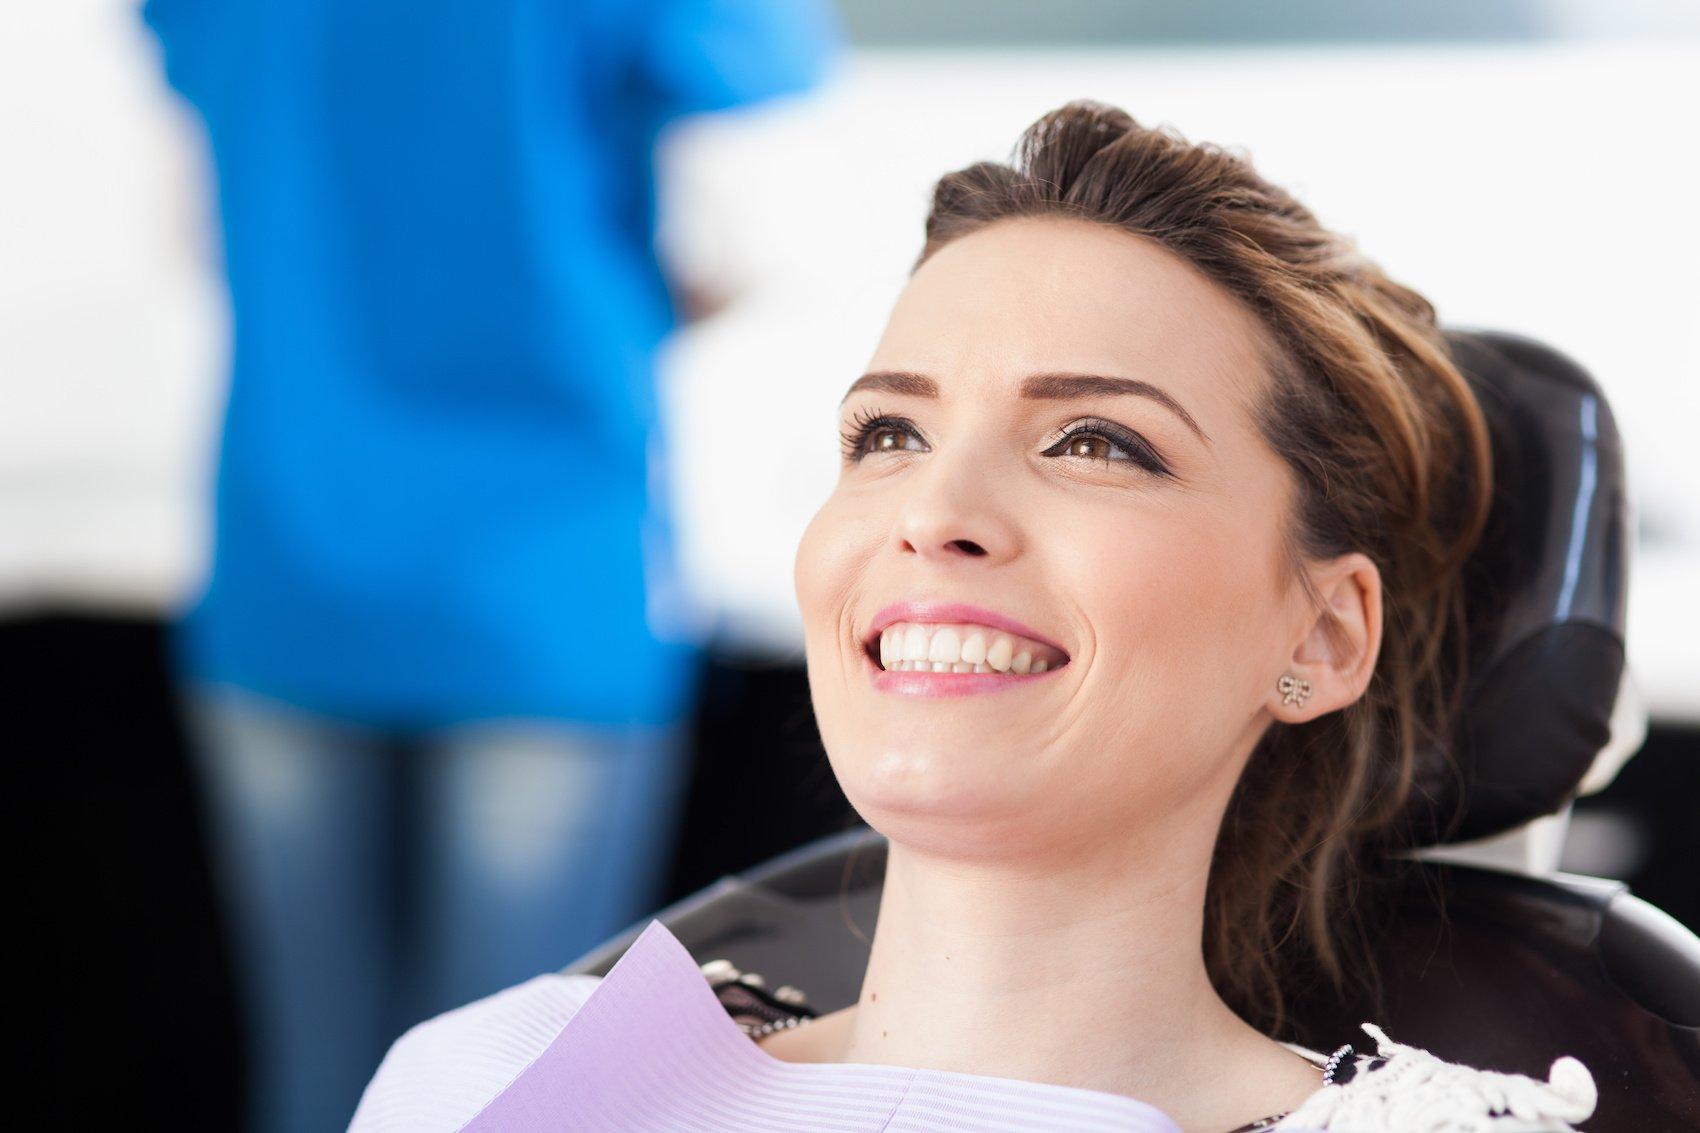 dentist cosmetic dentistry botox dr sandy crocker dr mitchell kelowna